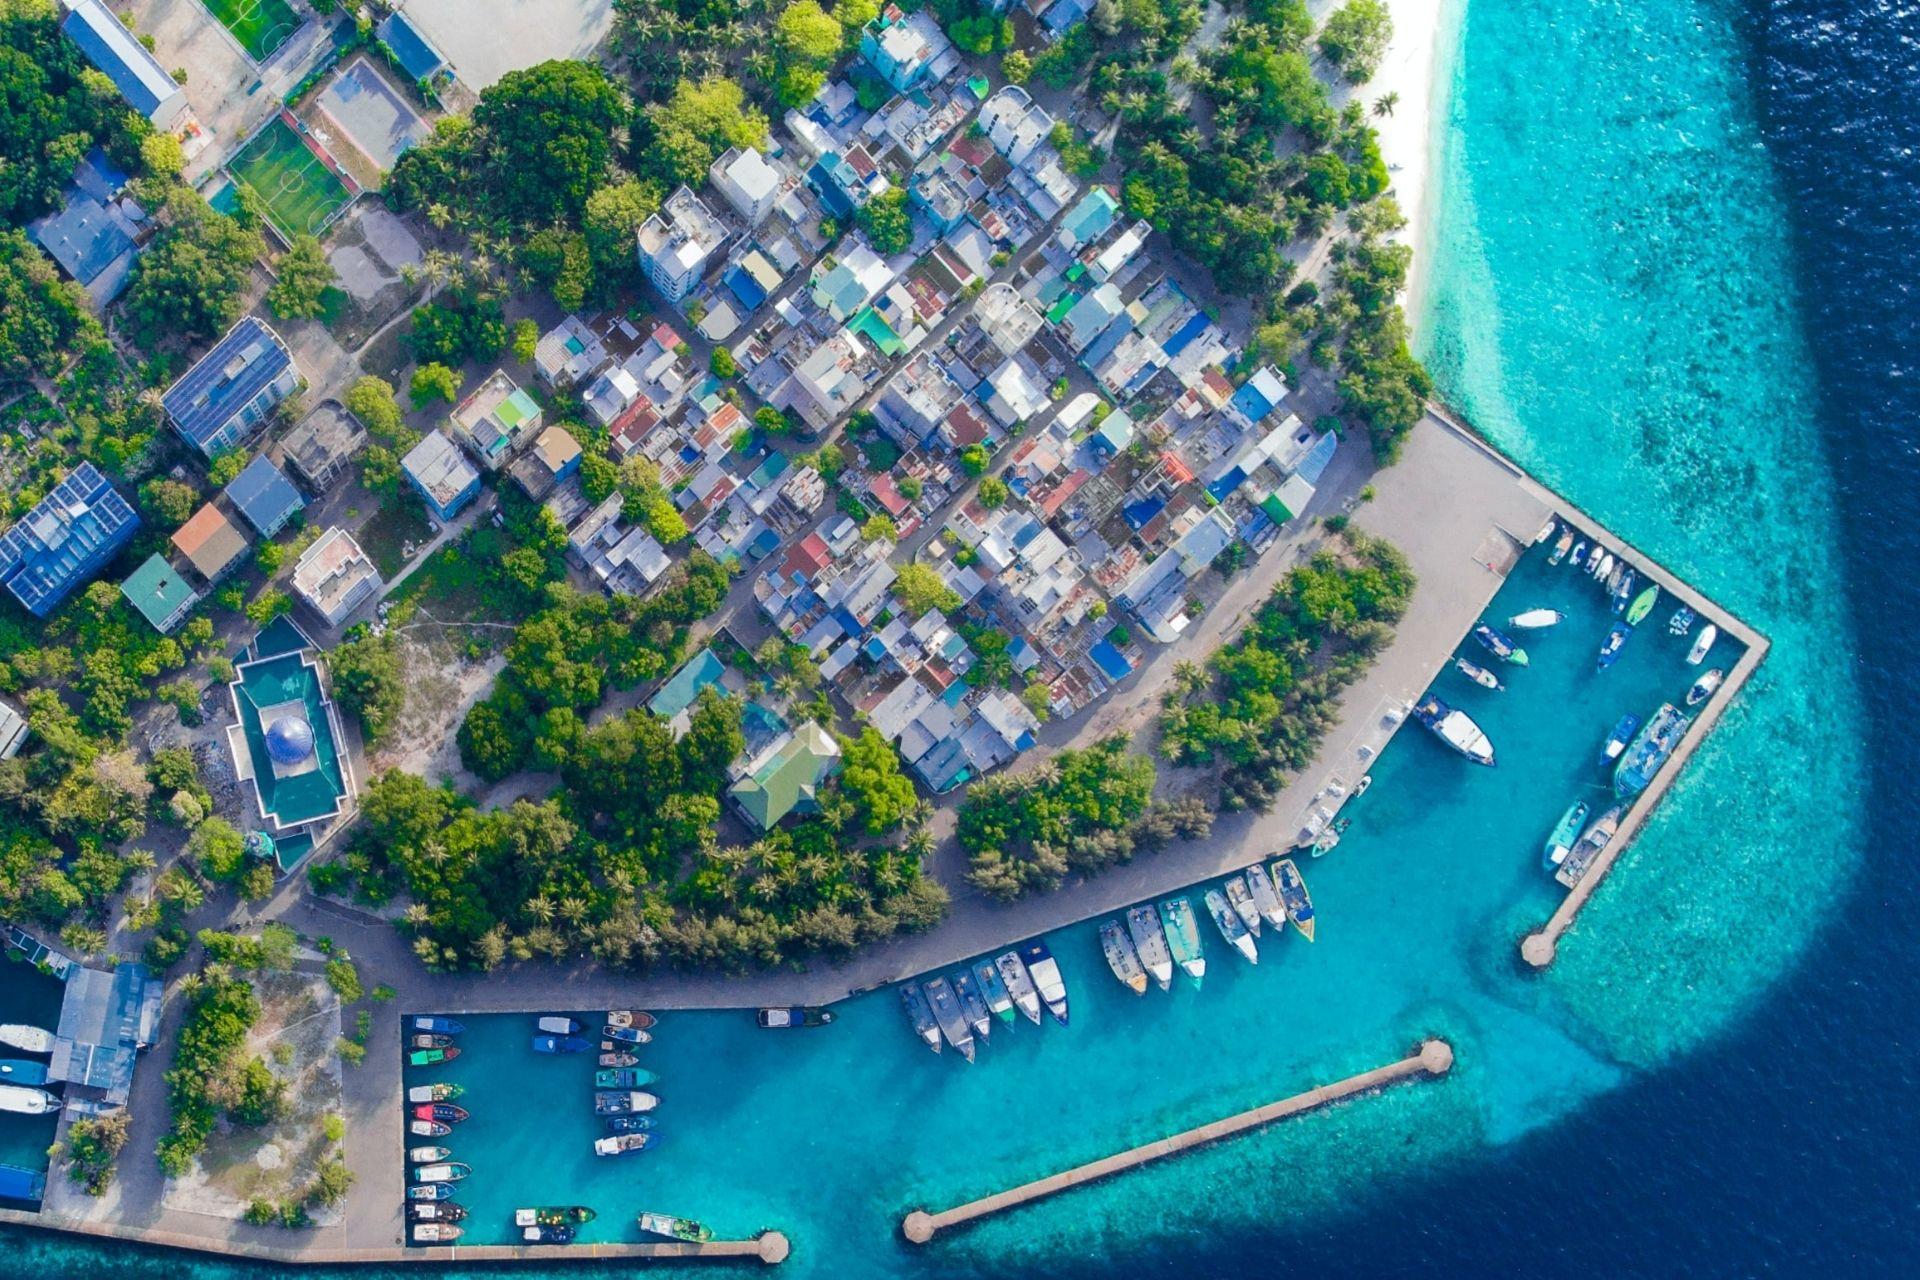 Activities & Things to do in Villingili (Villimalé) Island, Maldives